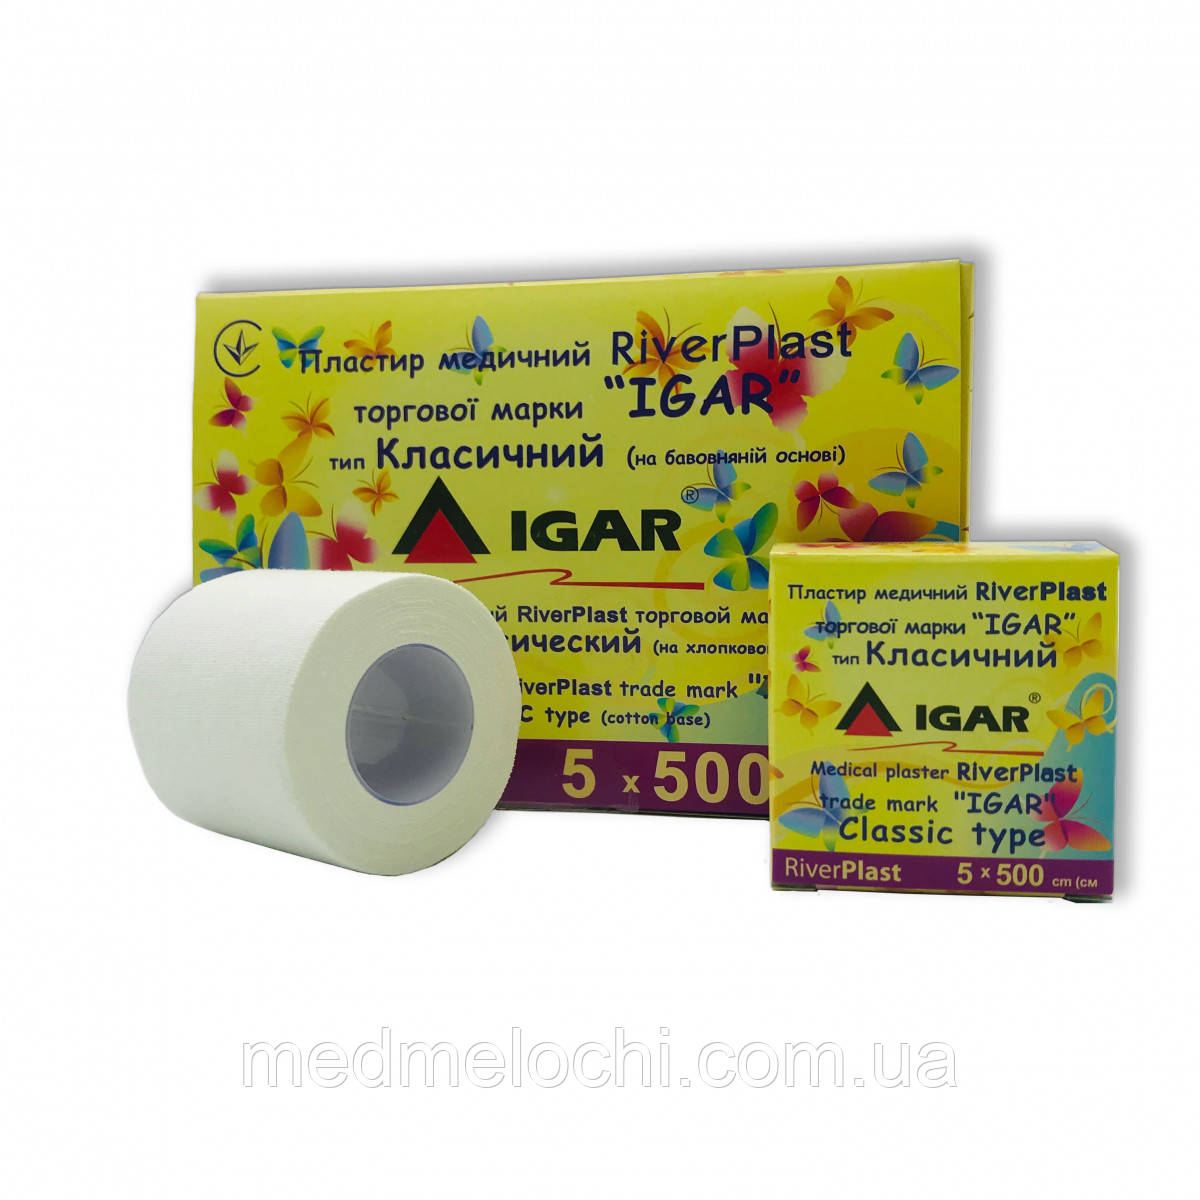 Пластир 5 х 500см класичний RiverPlast IGAR